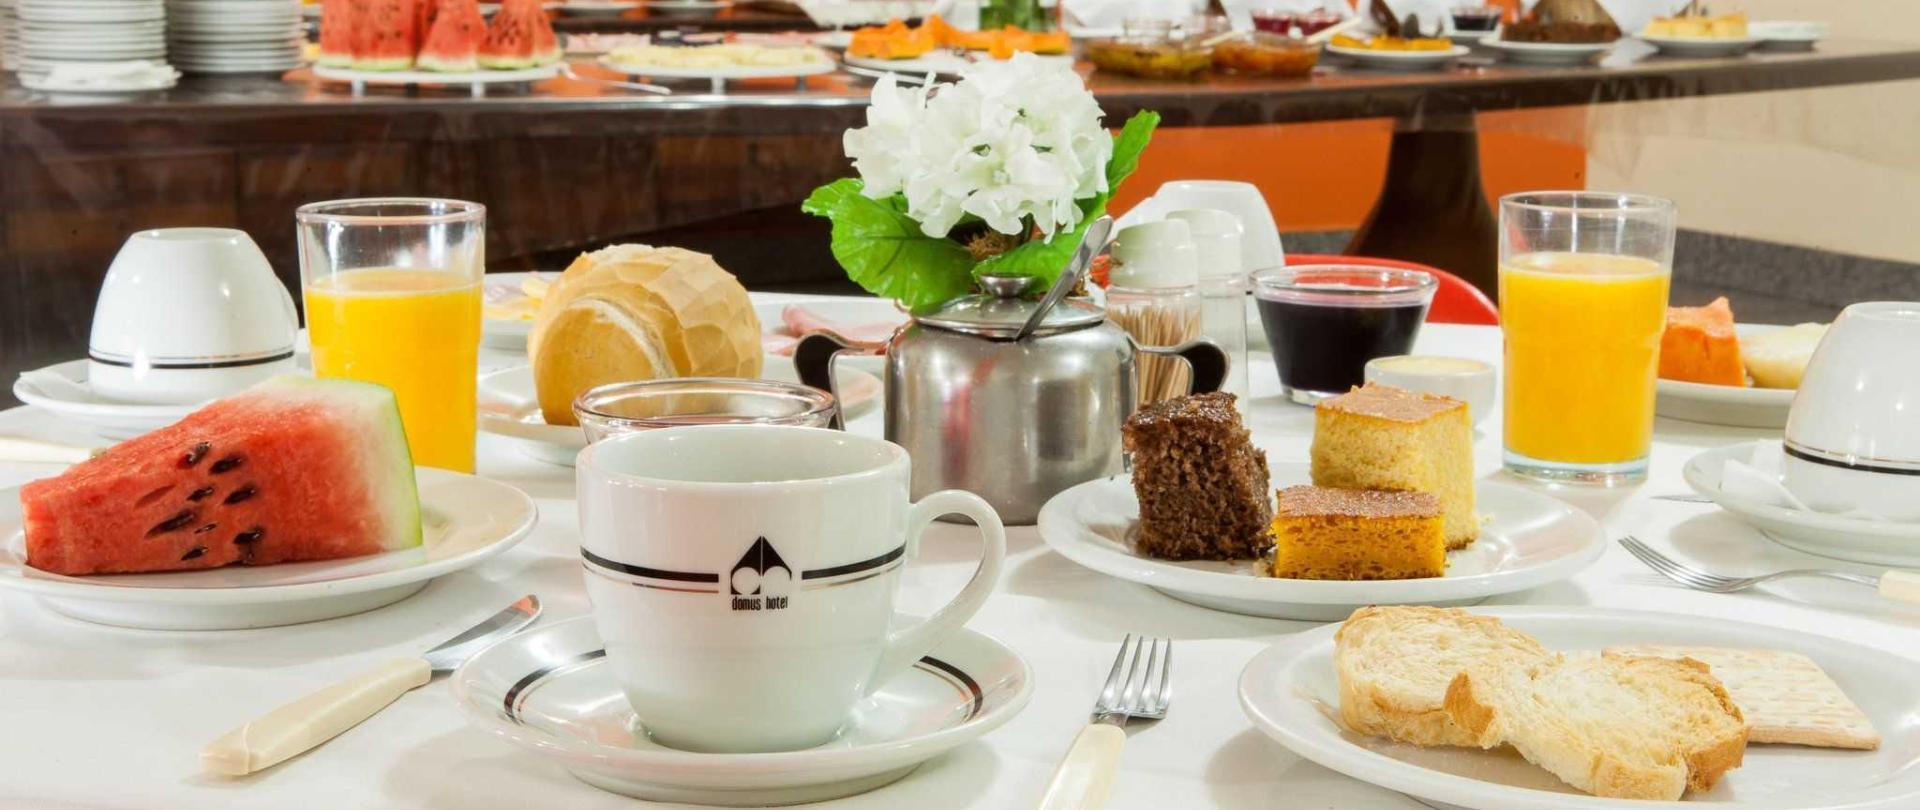 domus-hotel-buffet-caf-da-manh-centro-s-o-paulo-6.JPG